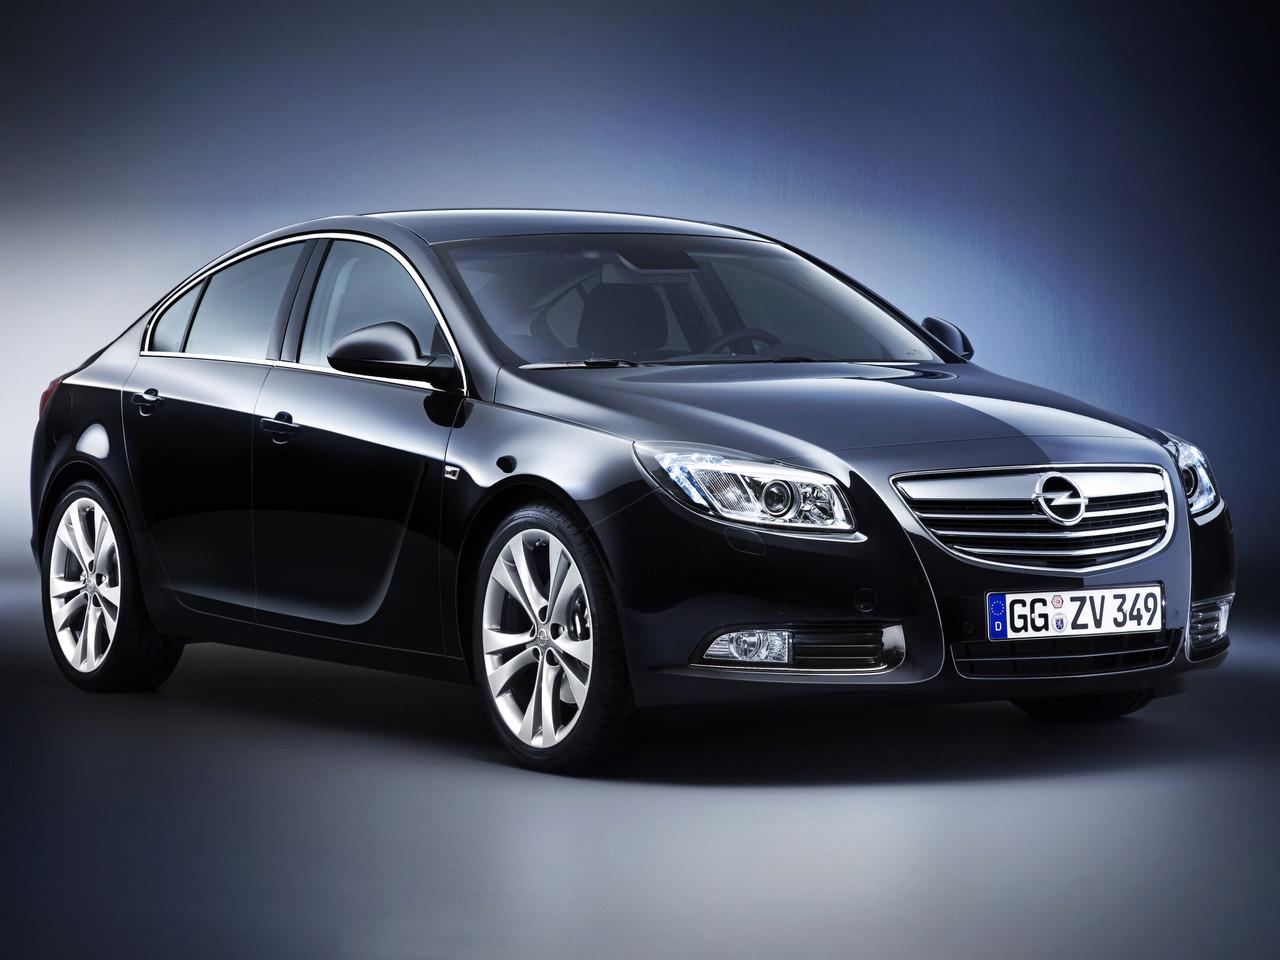 Лобовое стекло Opel Insignia с местом под датчик и молдингом (2008-)